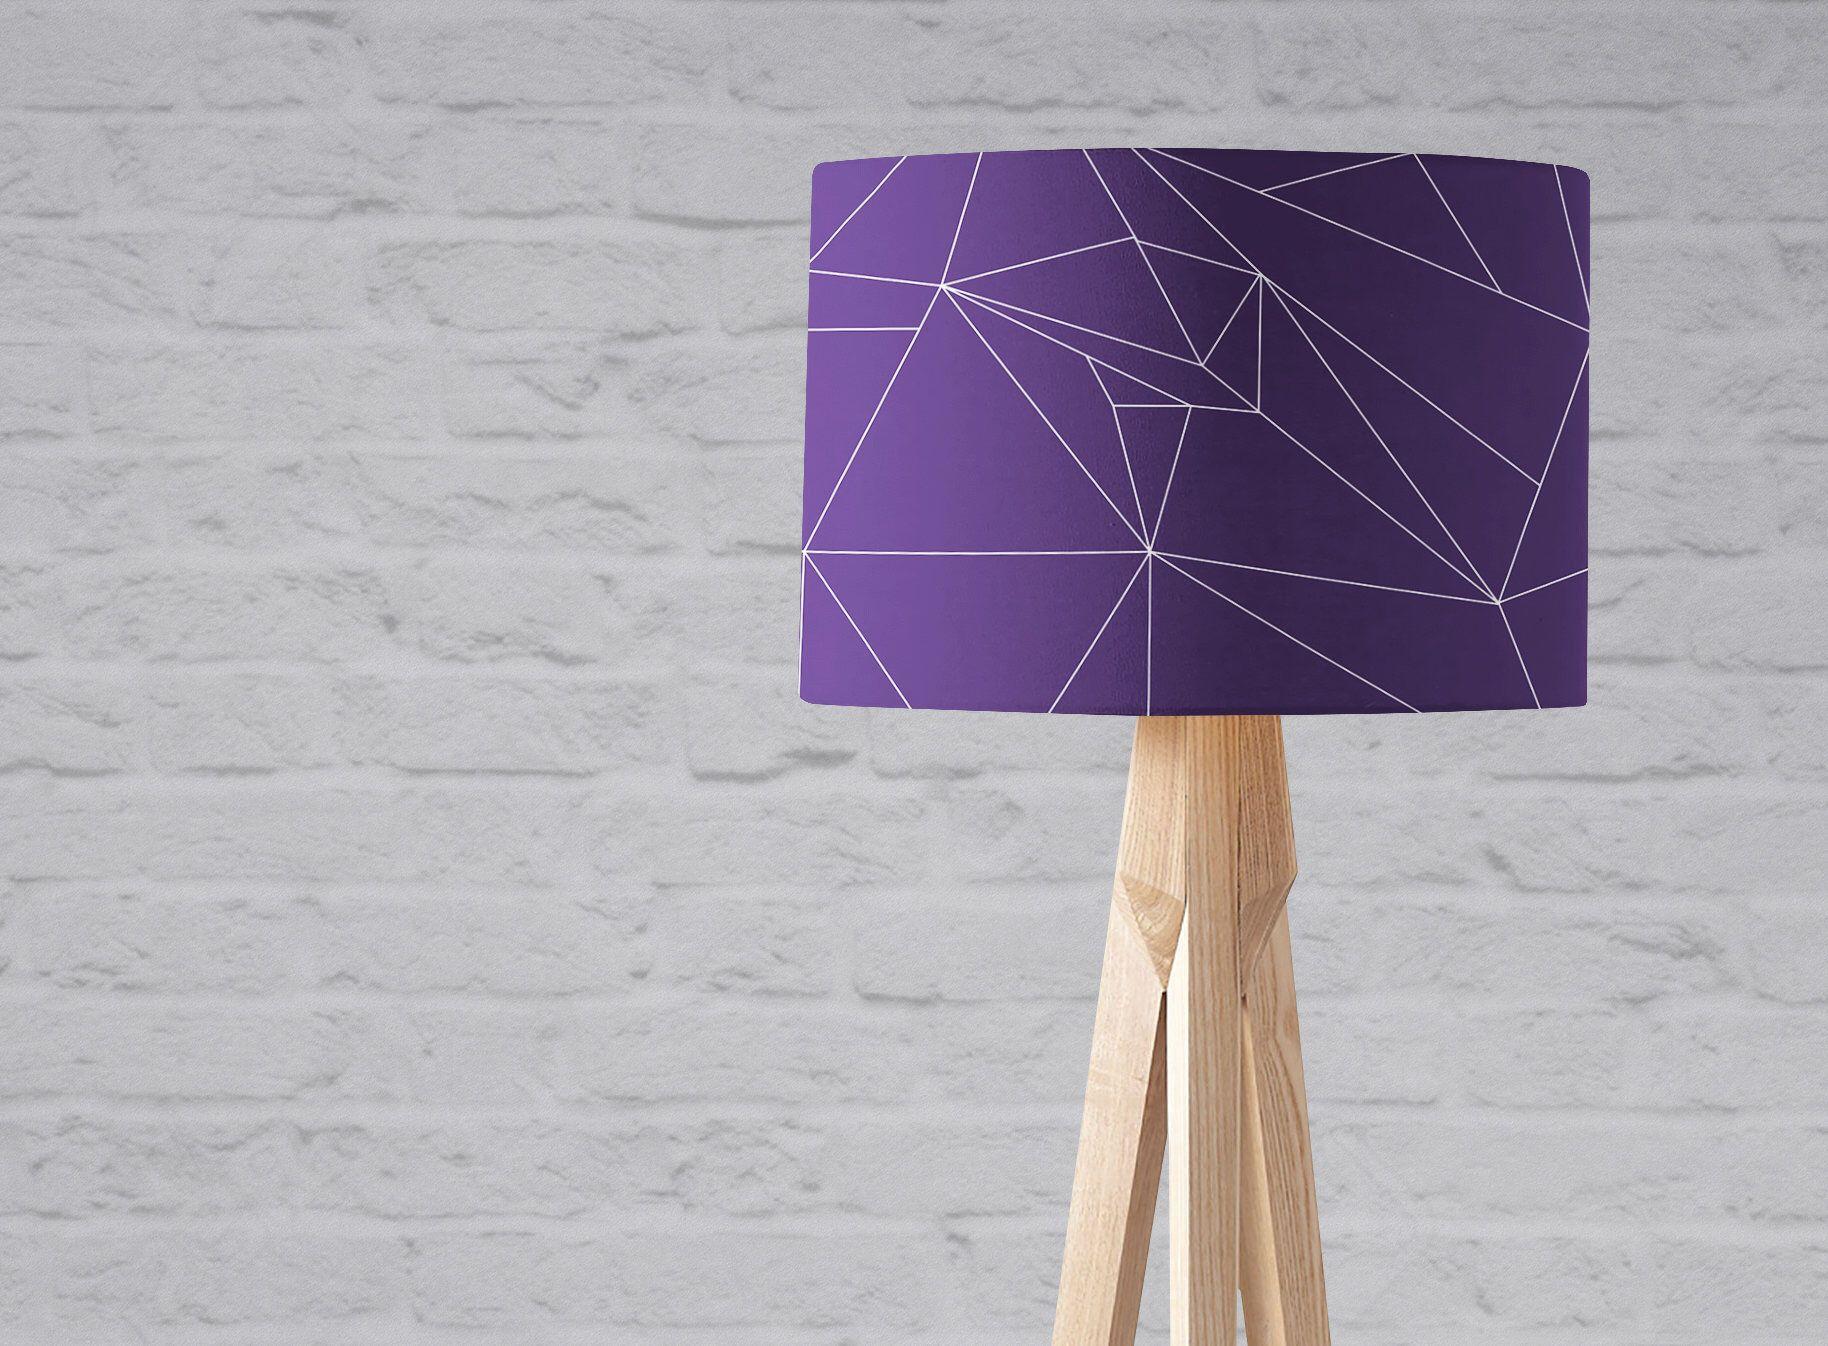 Purple Lamp Shade Purple Home Decor Violet Decor Modern Purple Trending Home Decor Purple Bedroom Decor P Purple Lamp Purple Lamp Shade Purple Home Decor